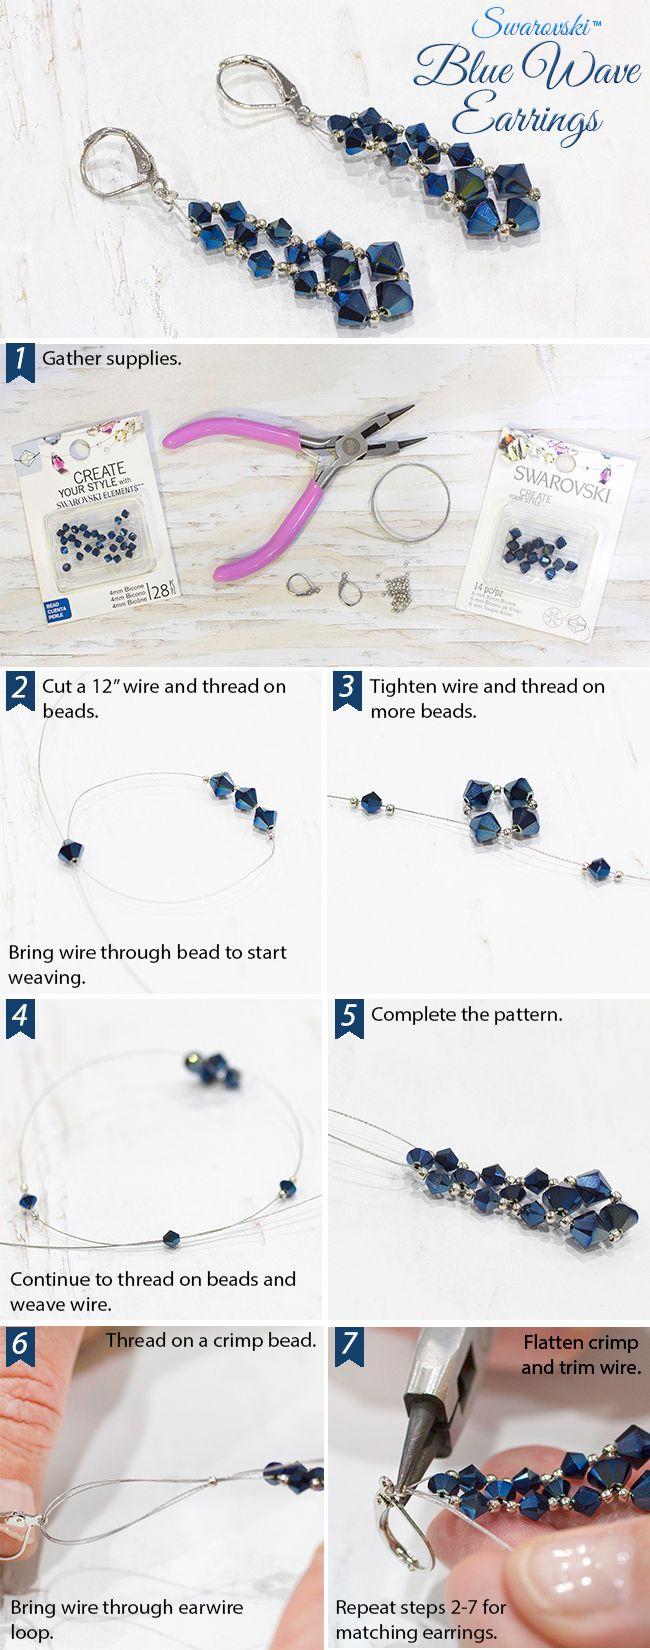 DIY Swarovski Blue Wave Earrings